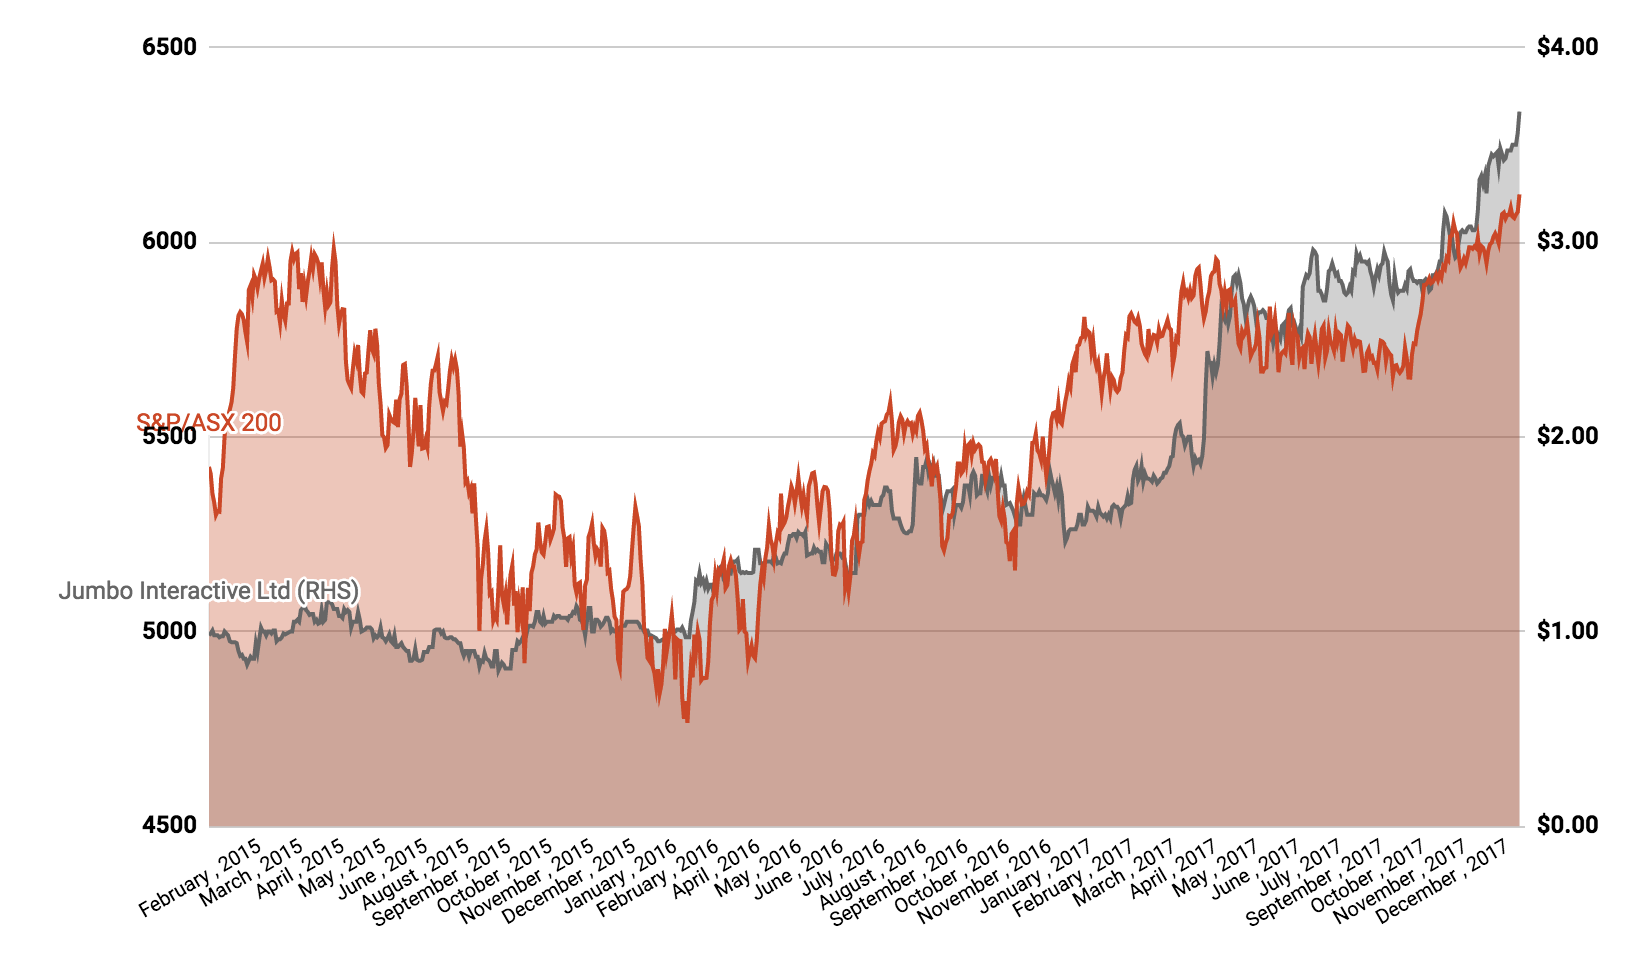 PPH share price